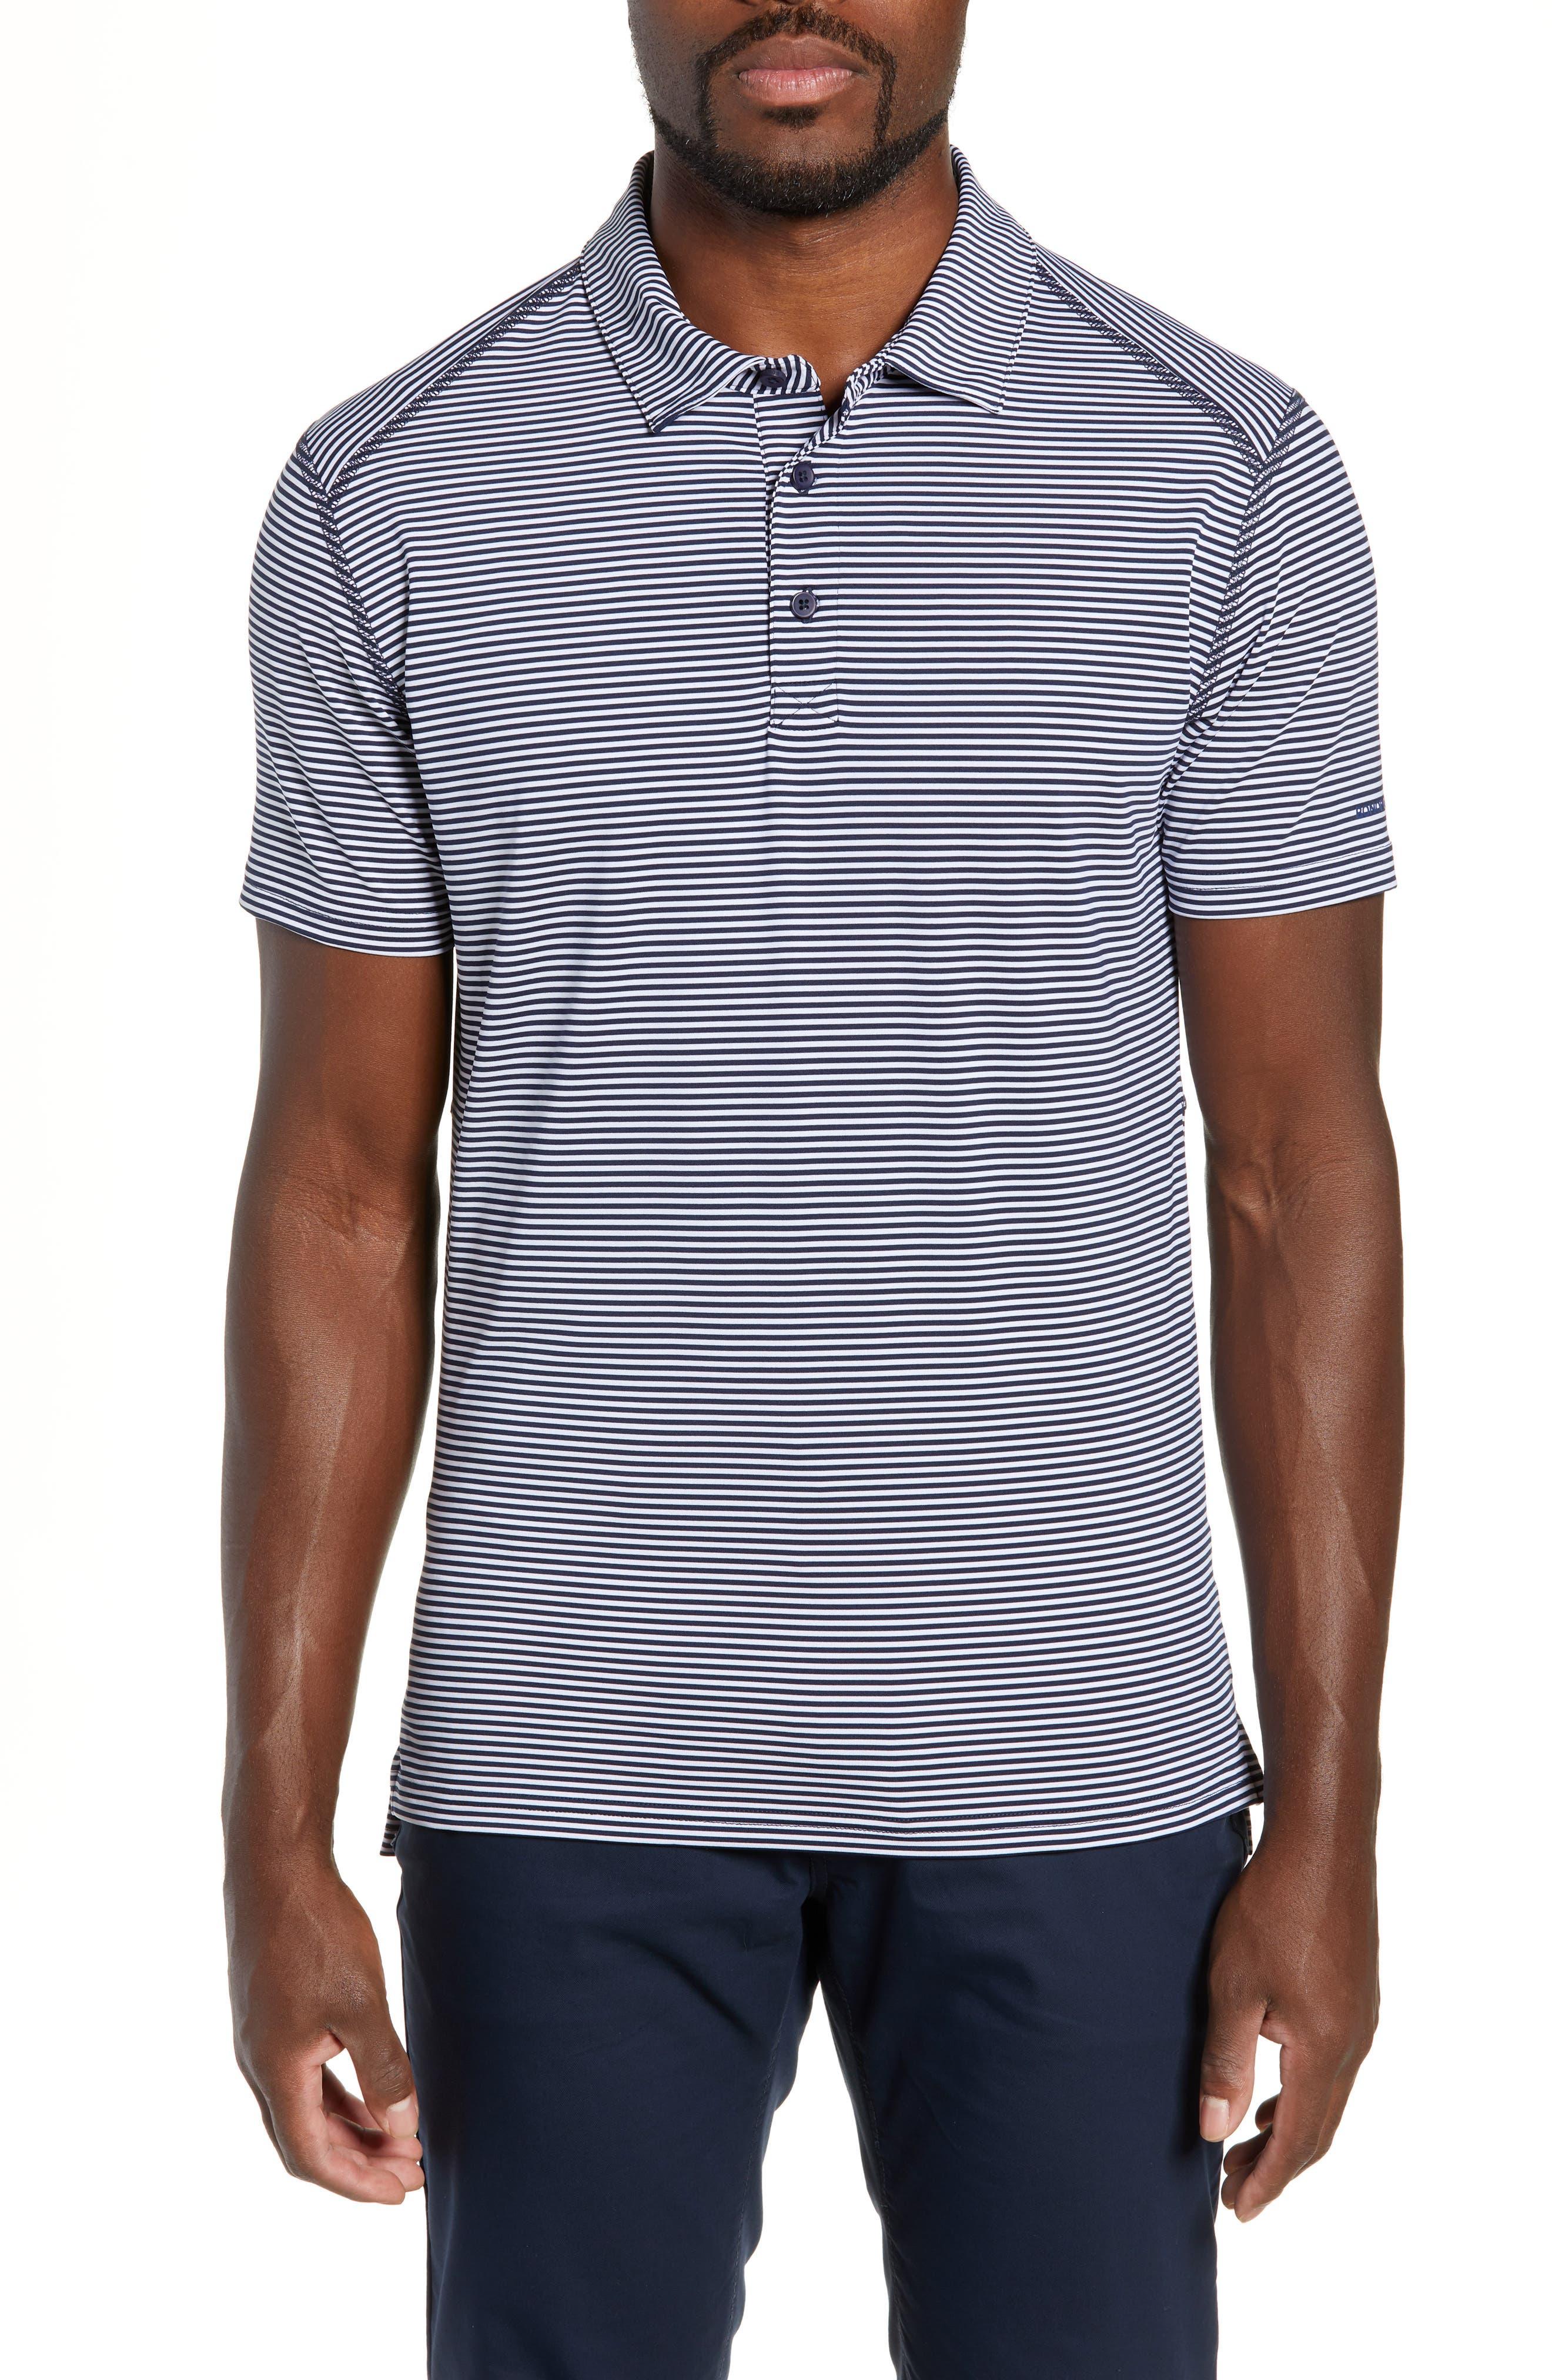 Flatiron Slim Fit Jacquard Jersey Polo,                             Main thumbnail 1, color,                             NAVY/ WHITE